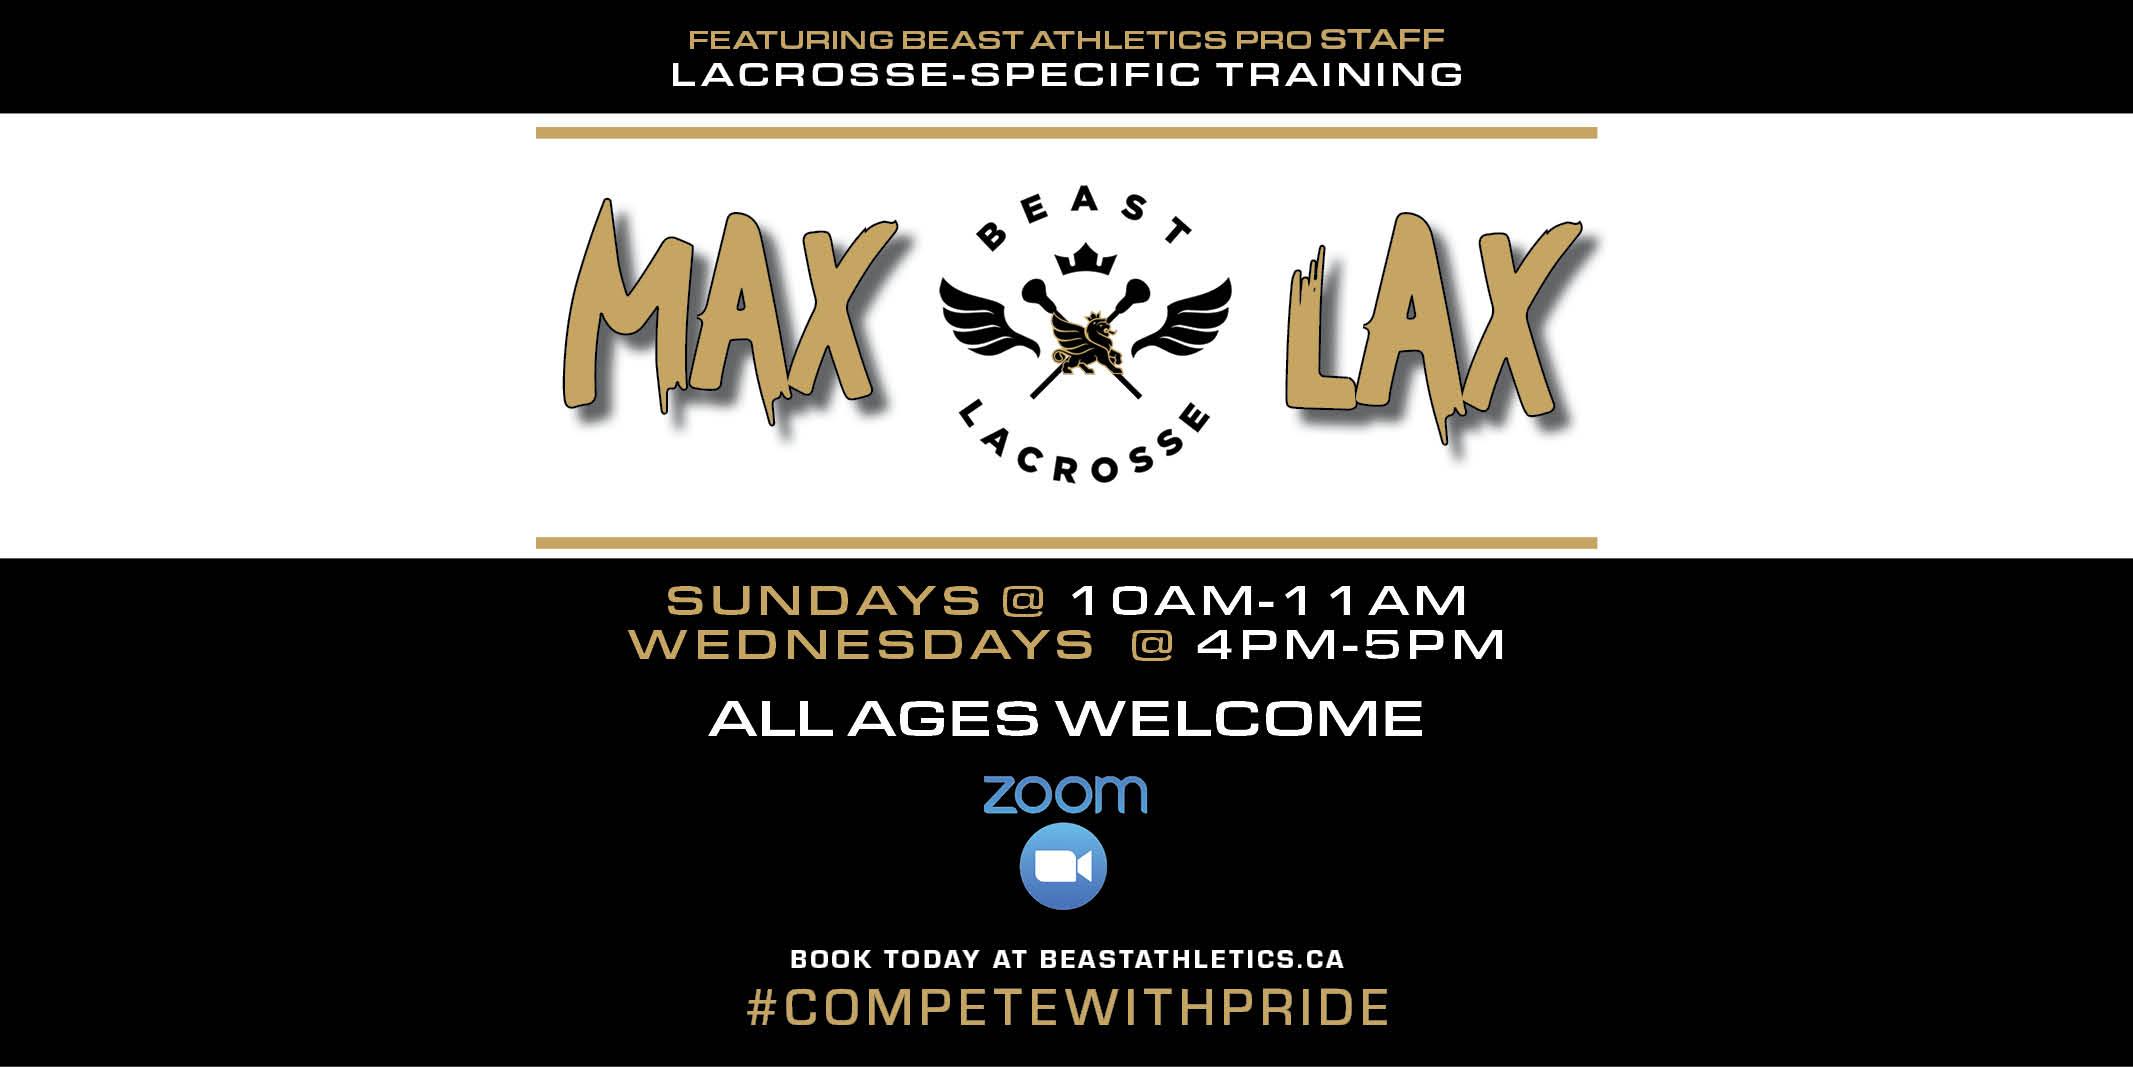 BEAST MAX LAX Lacrosse Training Sessions